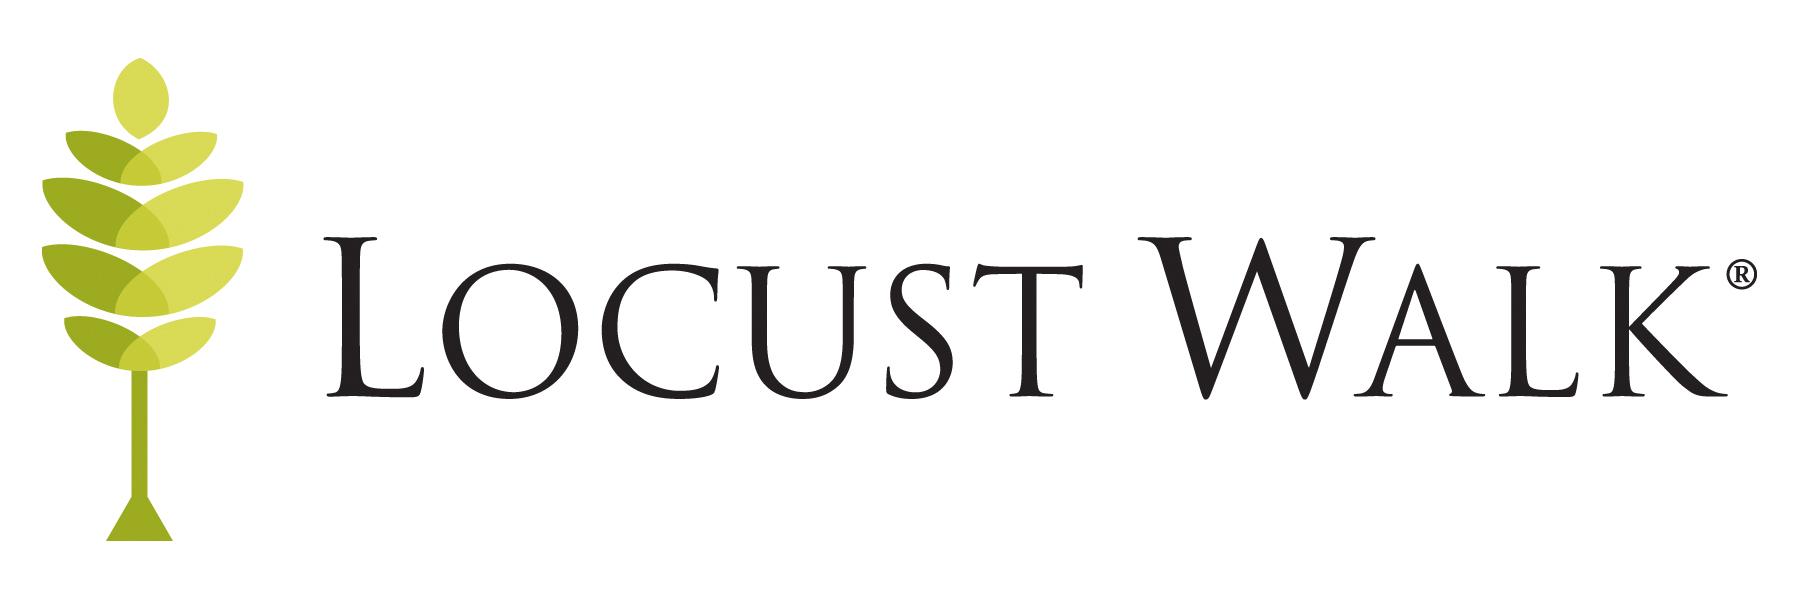 LocustWalk Logo - James Forte.jpg